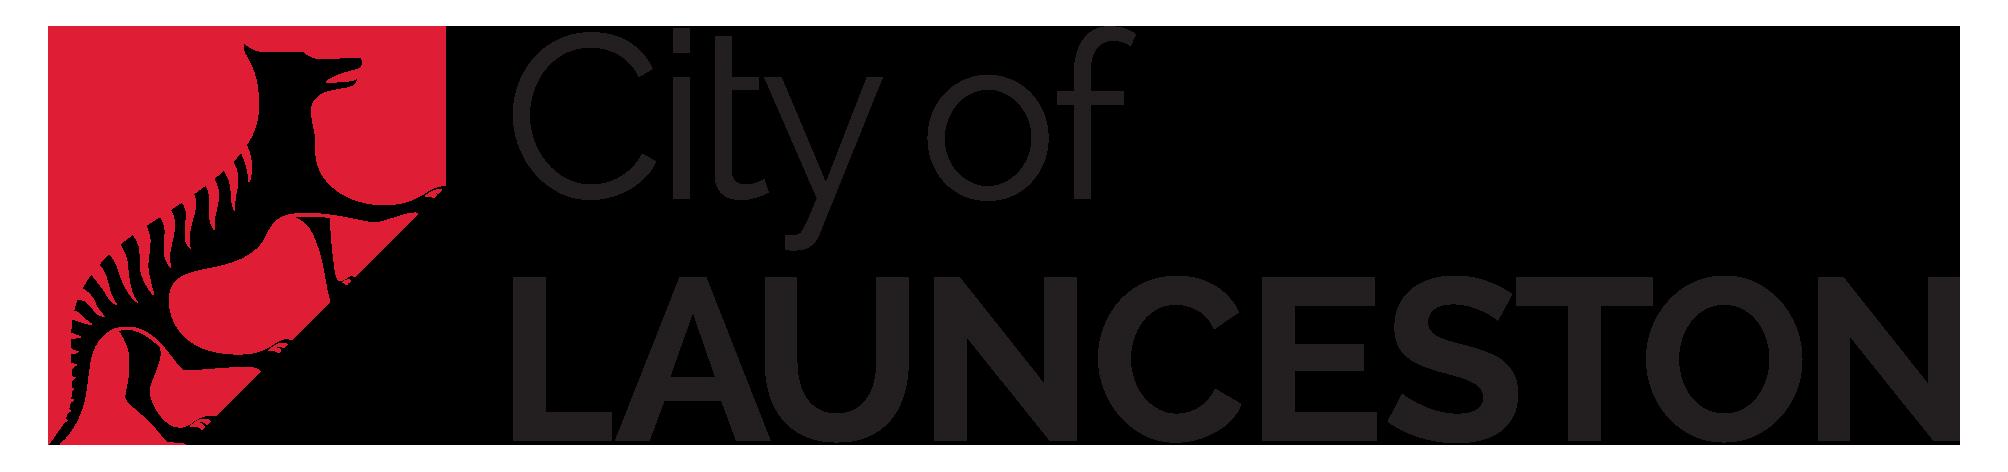 City of Launceston.png